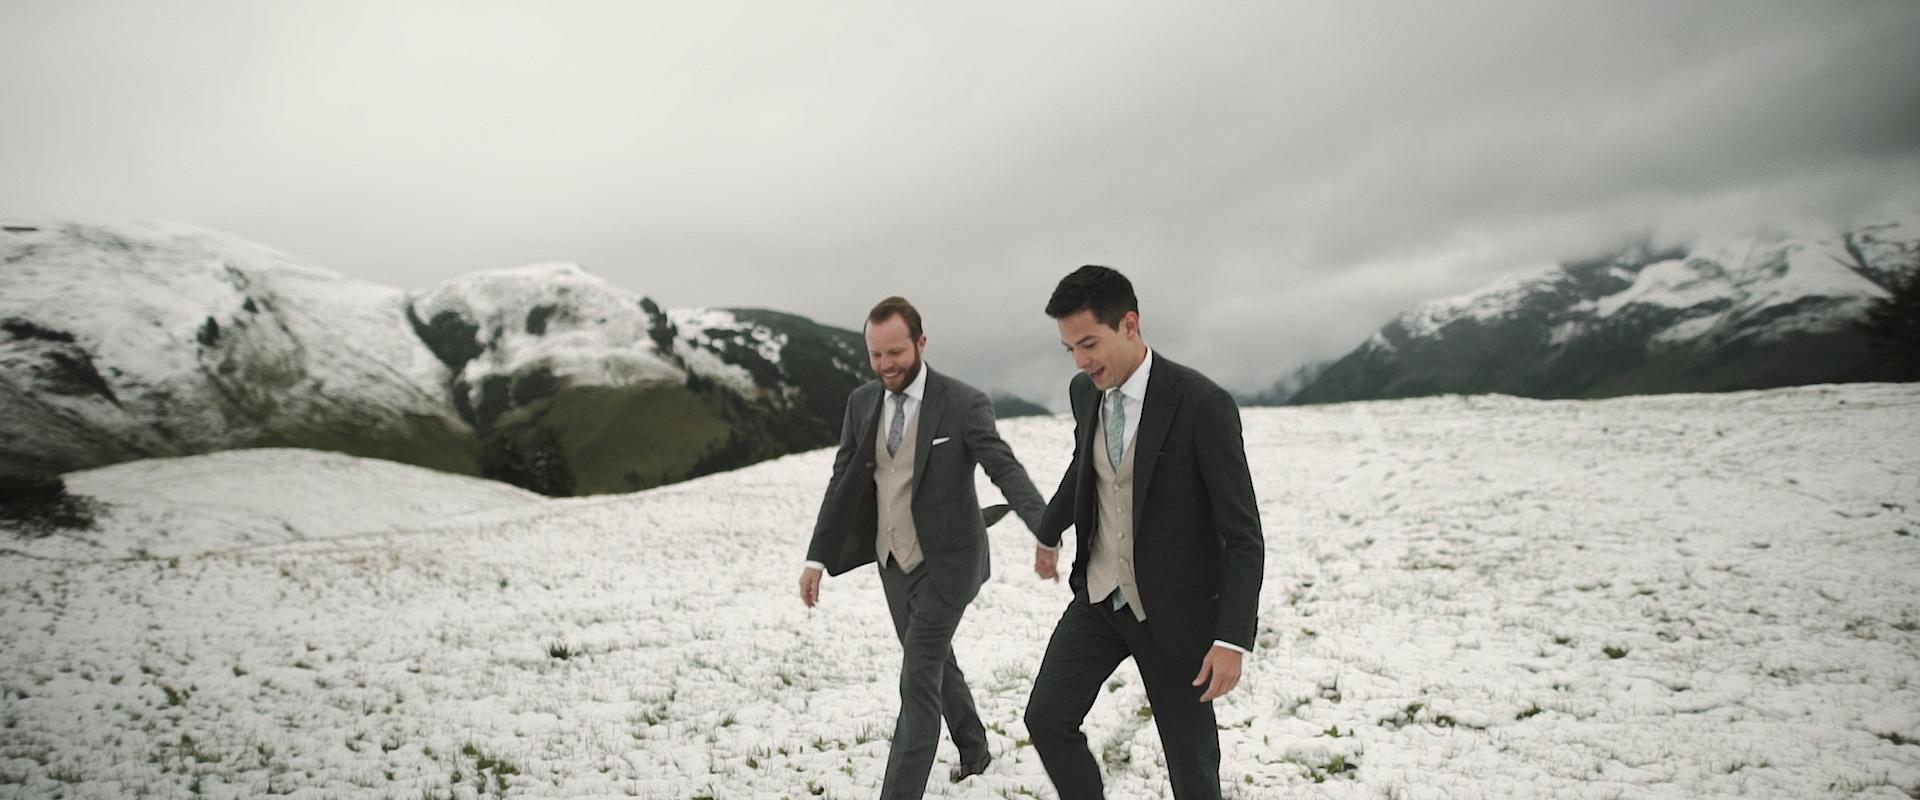 Mountain wedding film Lech Austria / Benny & Patrick